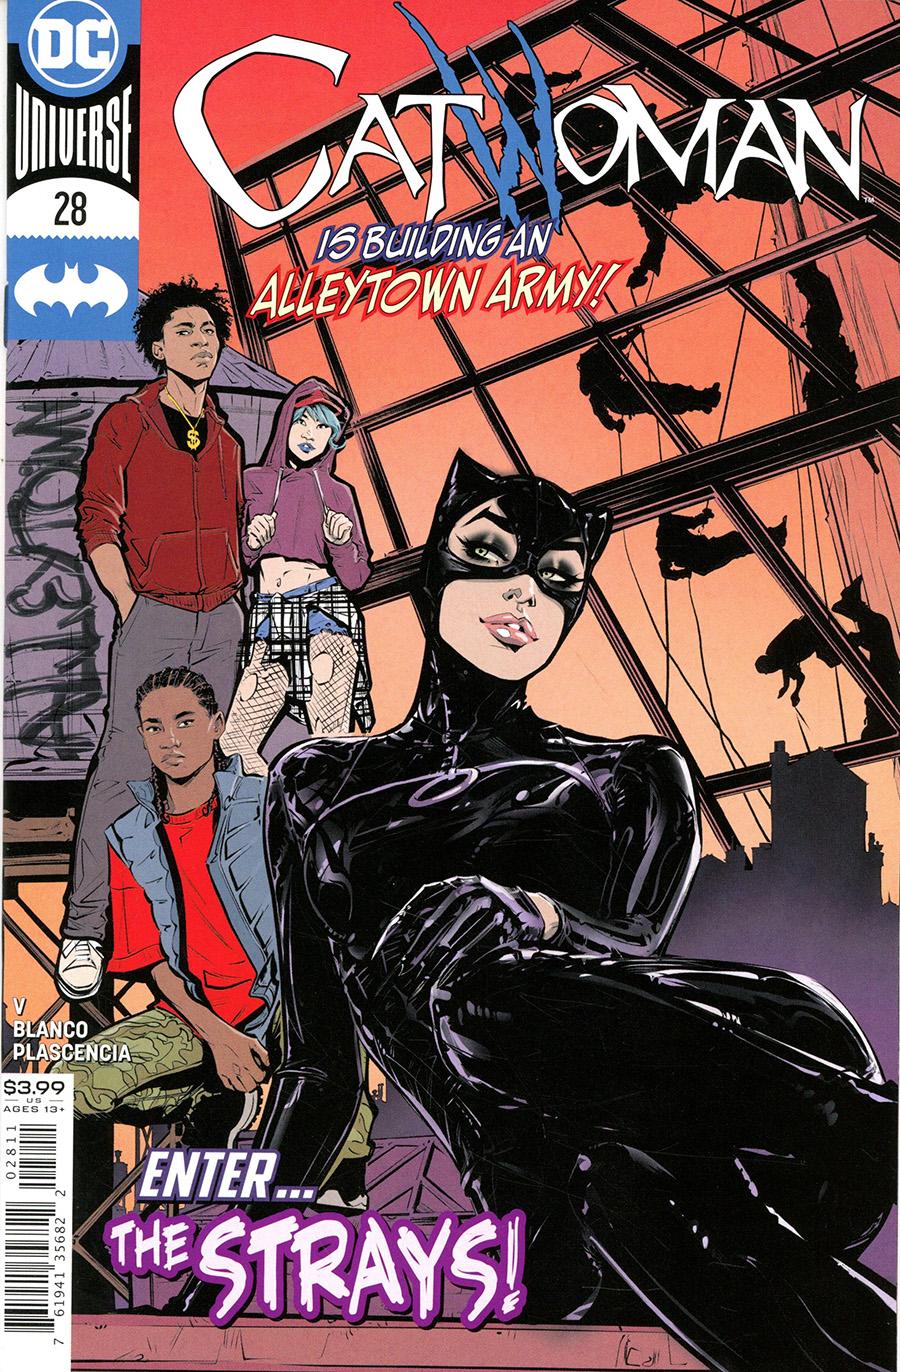 Catwoman Vol 5 #28 Cover A Regular Joelle Jones Cover